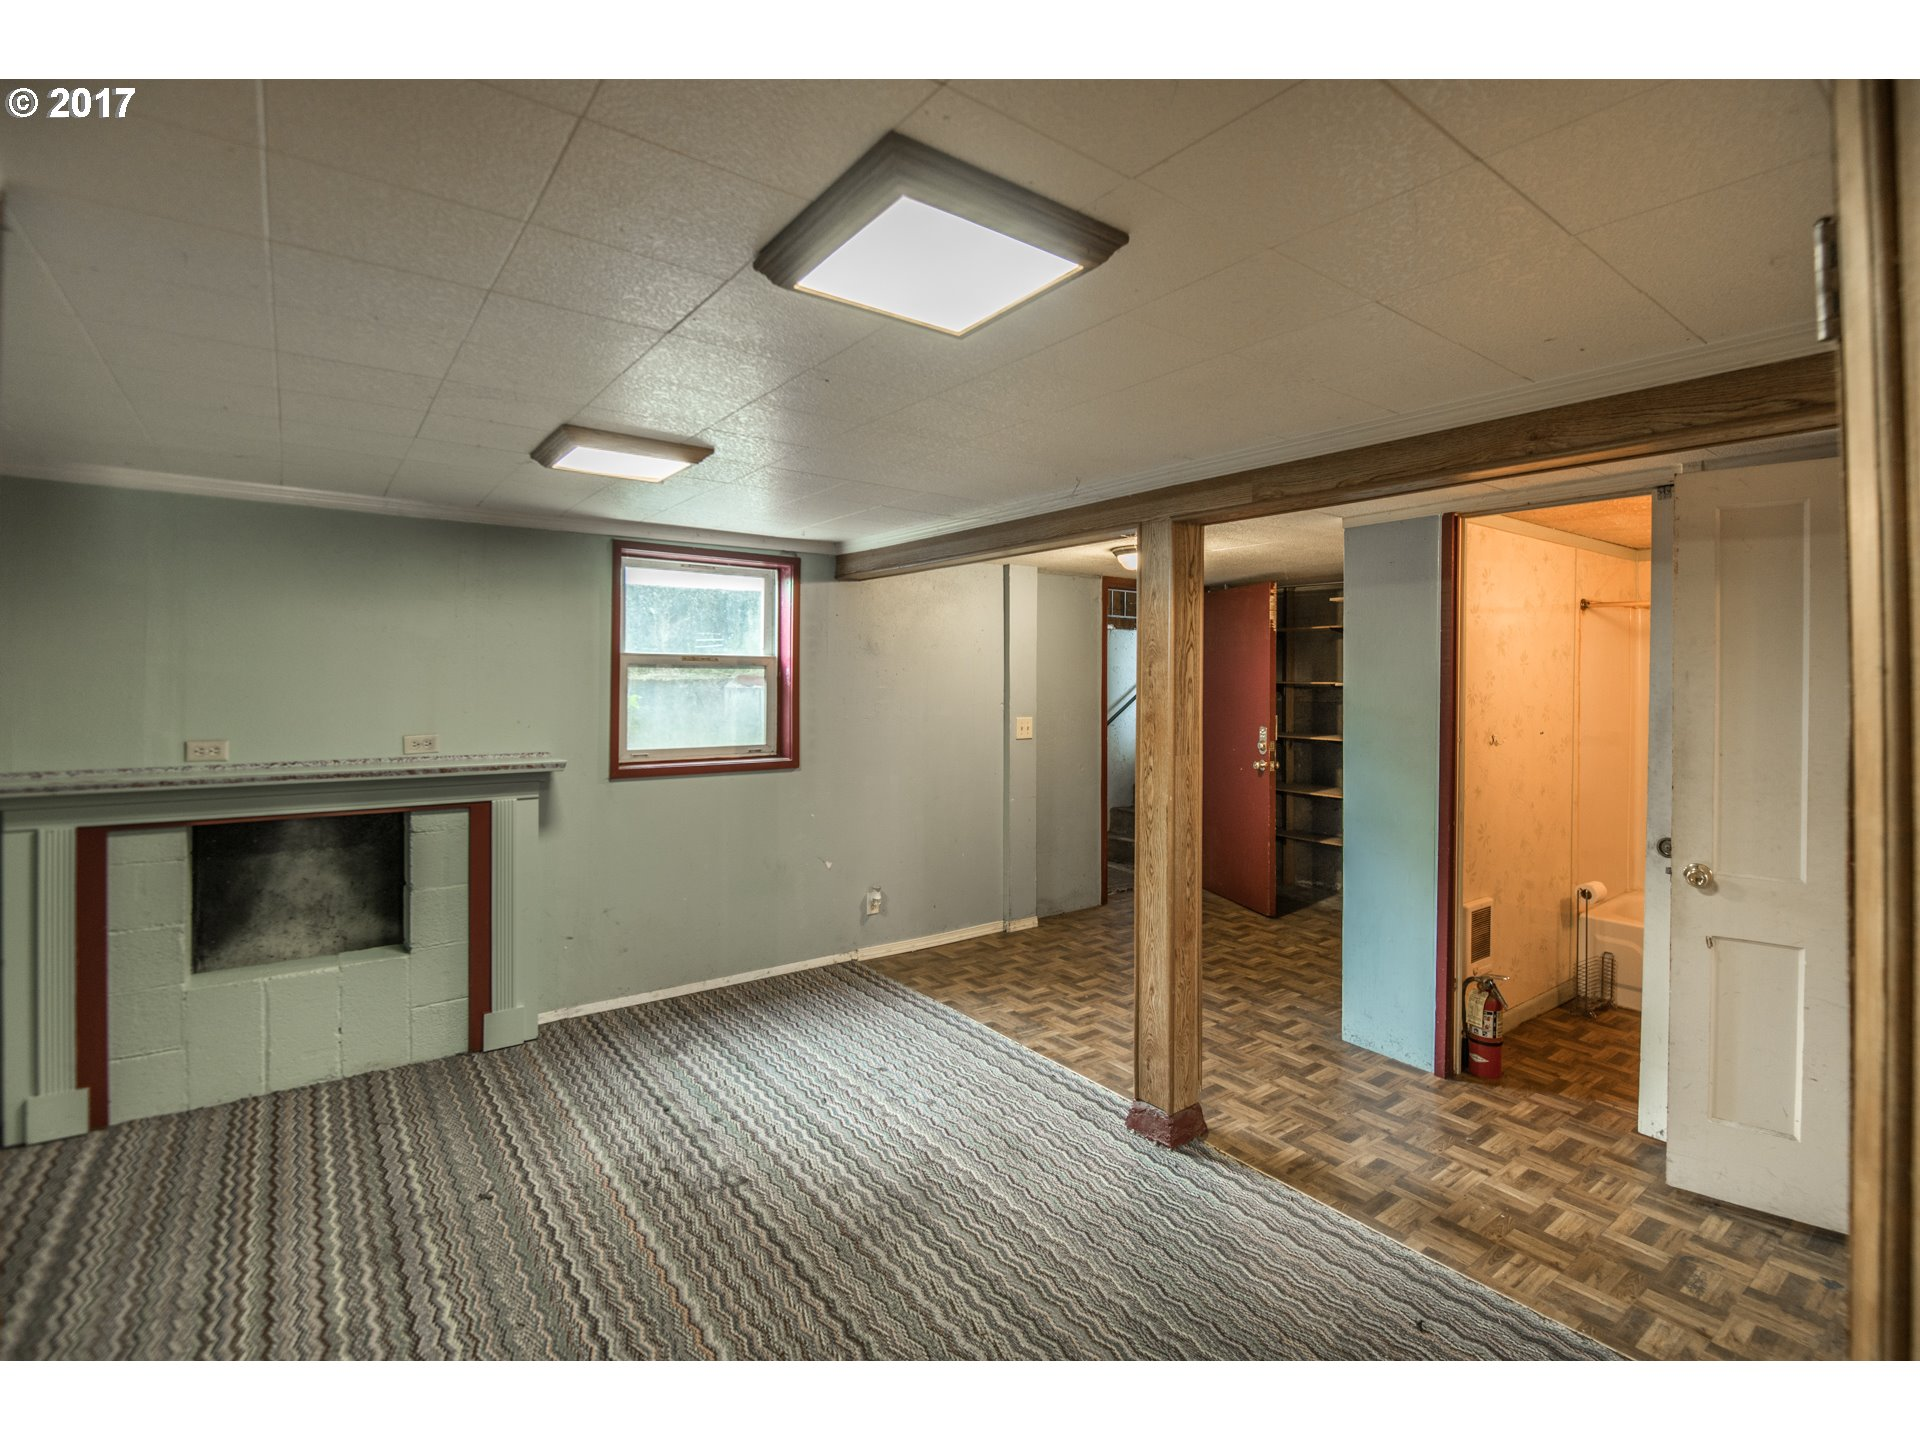 10116 NE WEIDLER ST Portland, OR 97220 - MLS #: 17630552